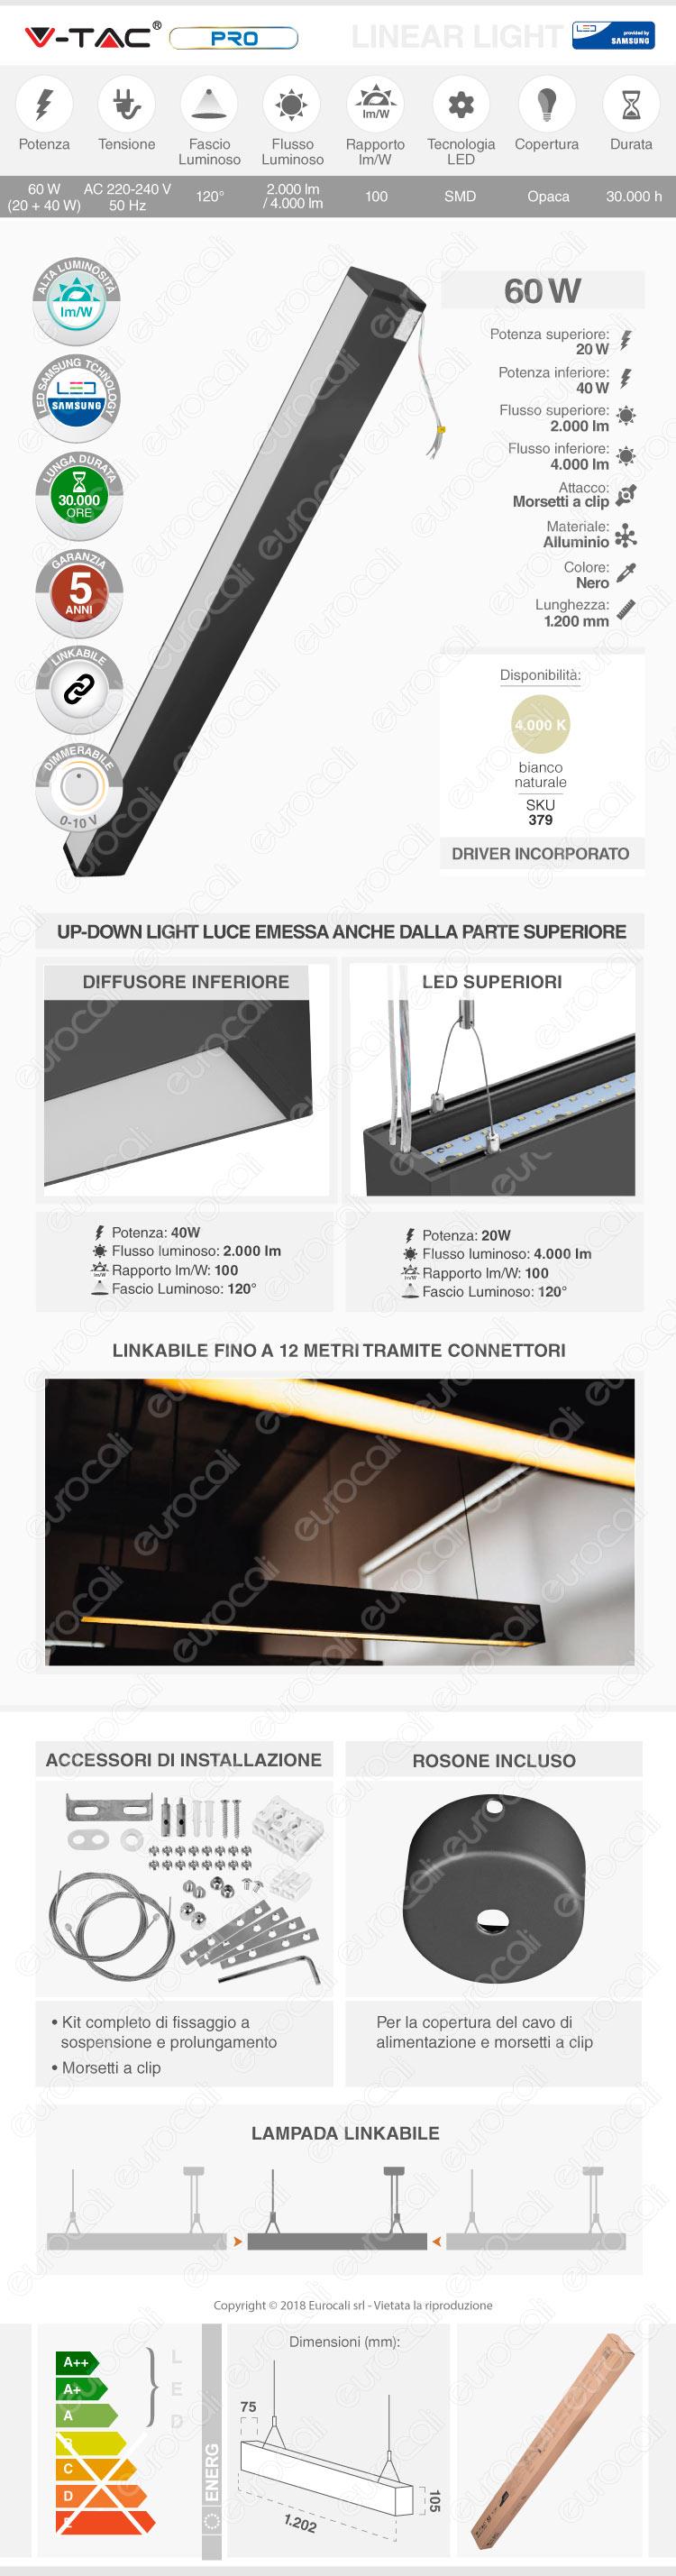 V-Tac PRO VT-7-60 Lampada LED a Sospensione Linear Light 60W Chip Samsung Black Body Dimmerabile